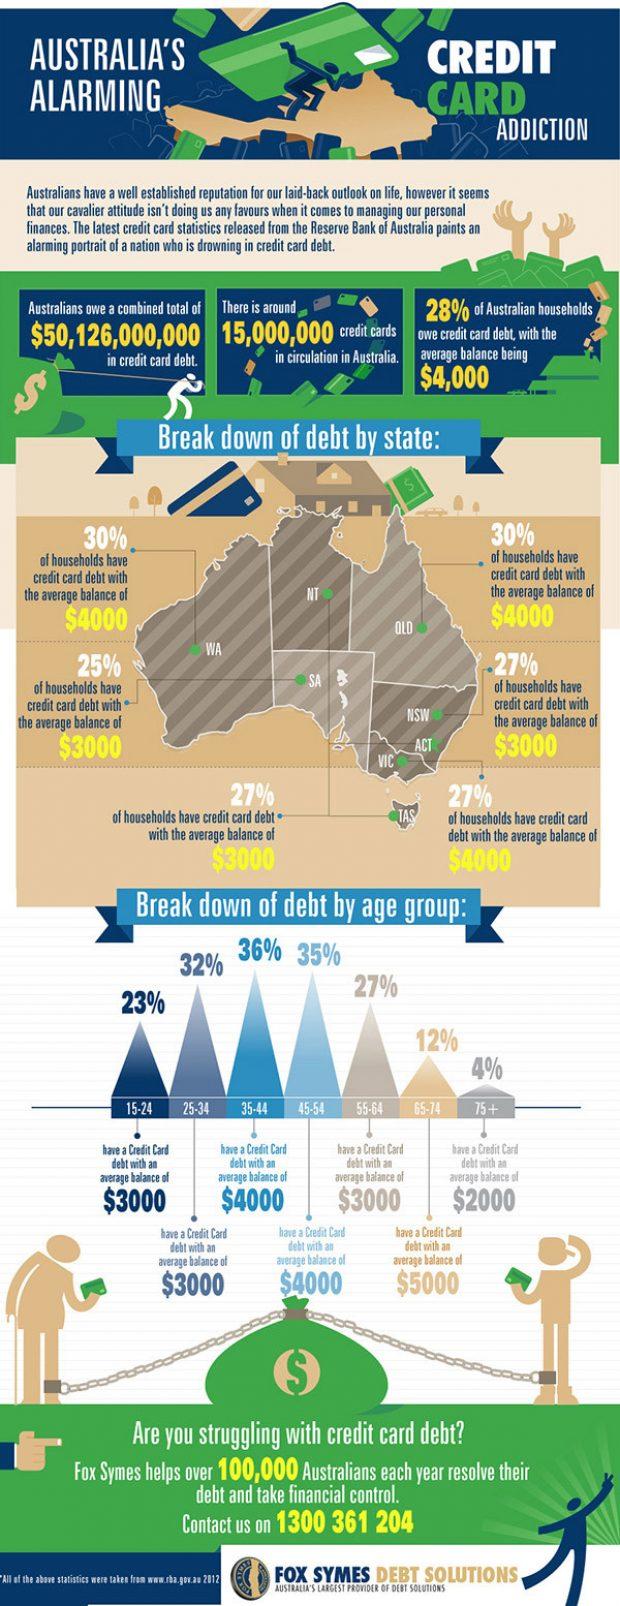 Australia's Alarming Credit Card Addiction